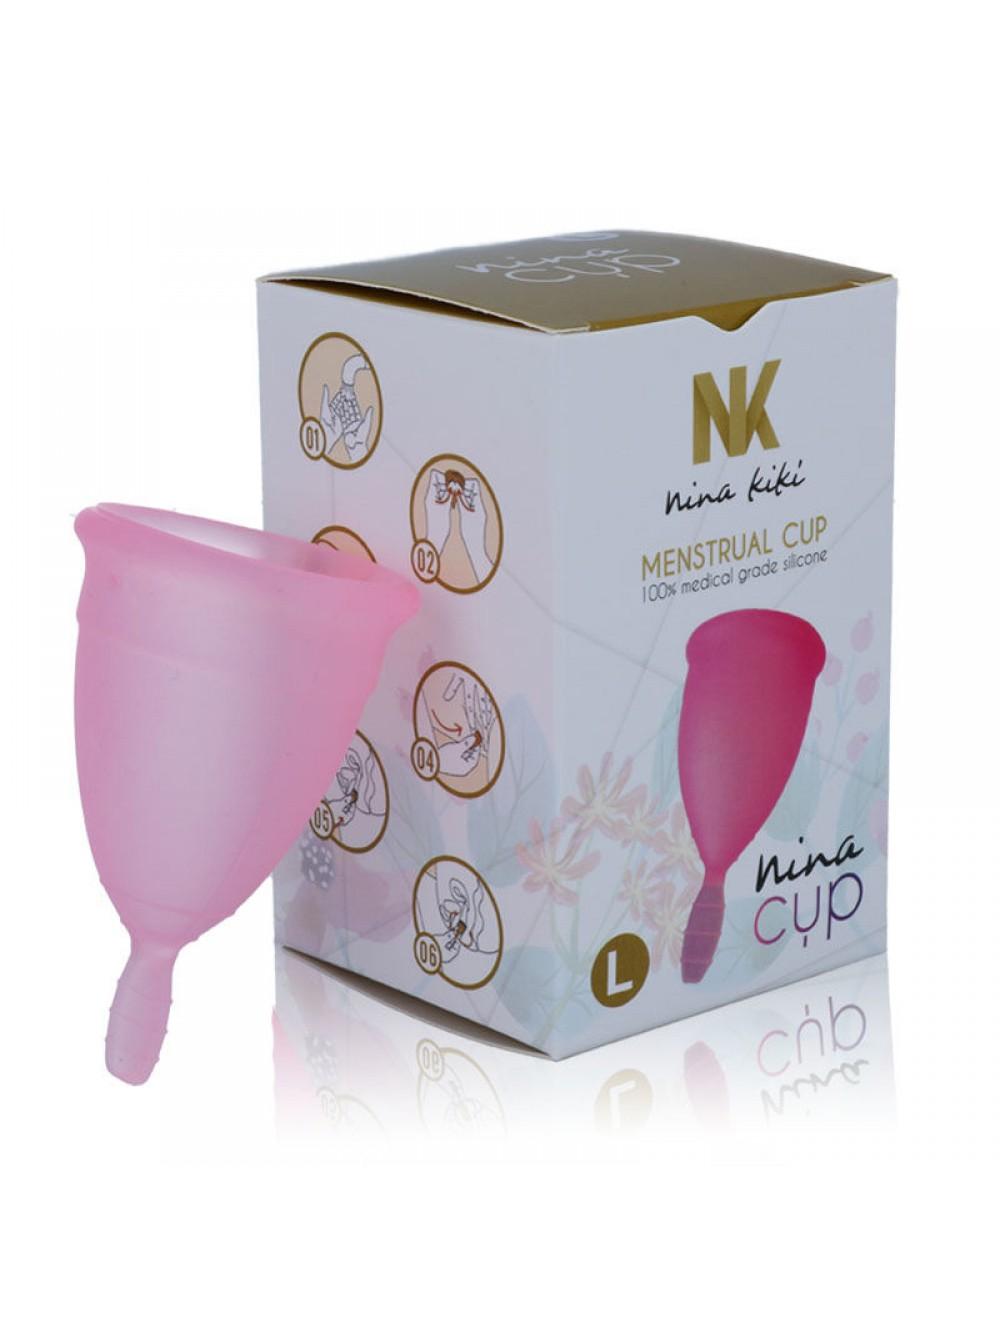 NINA CUP MENSTRUAL CUP SIZE PINK L 8425402155219